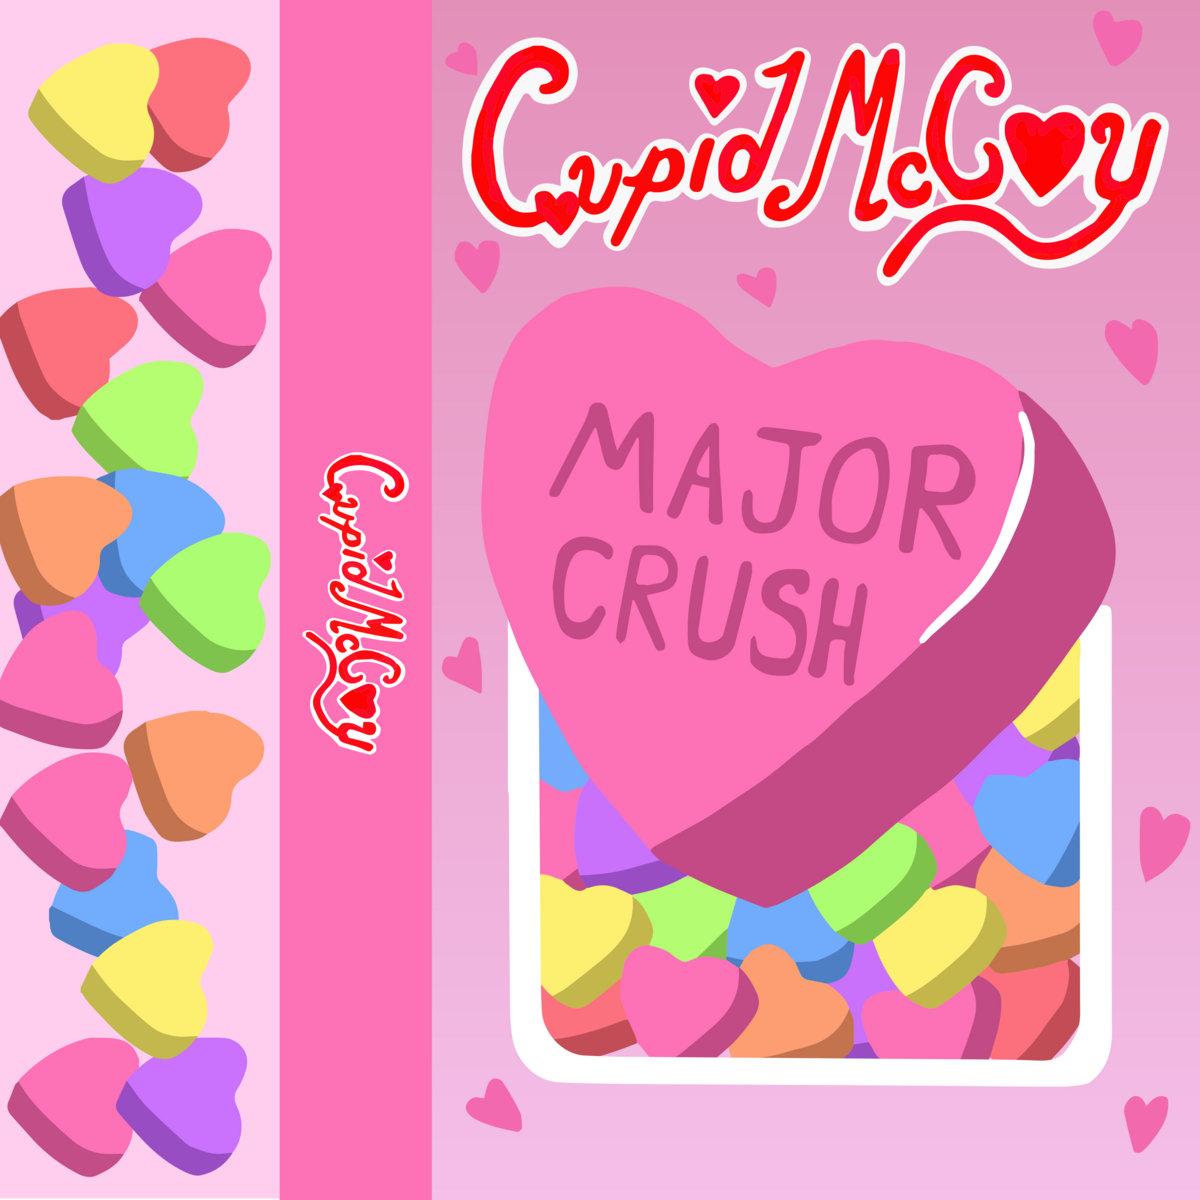 Cupid McCoy